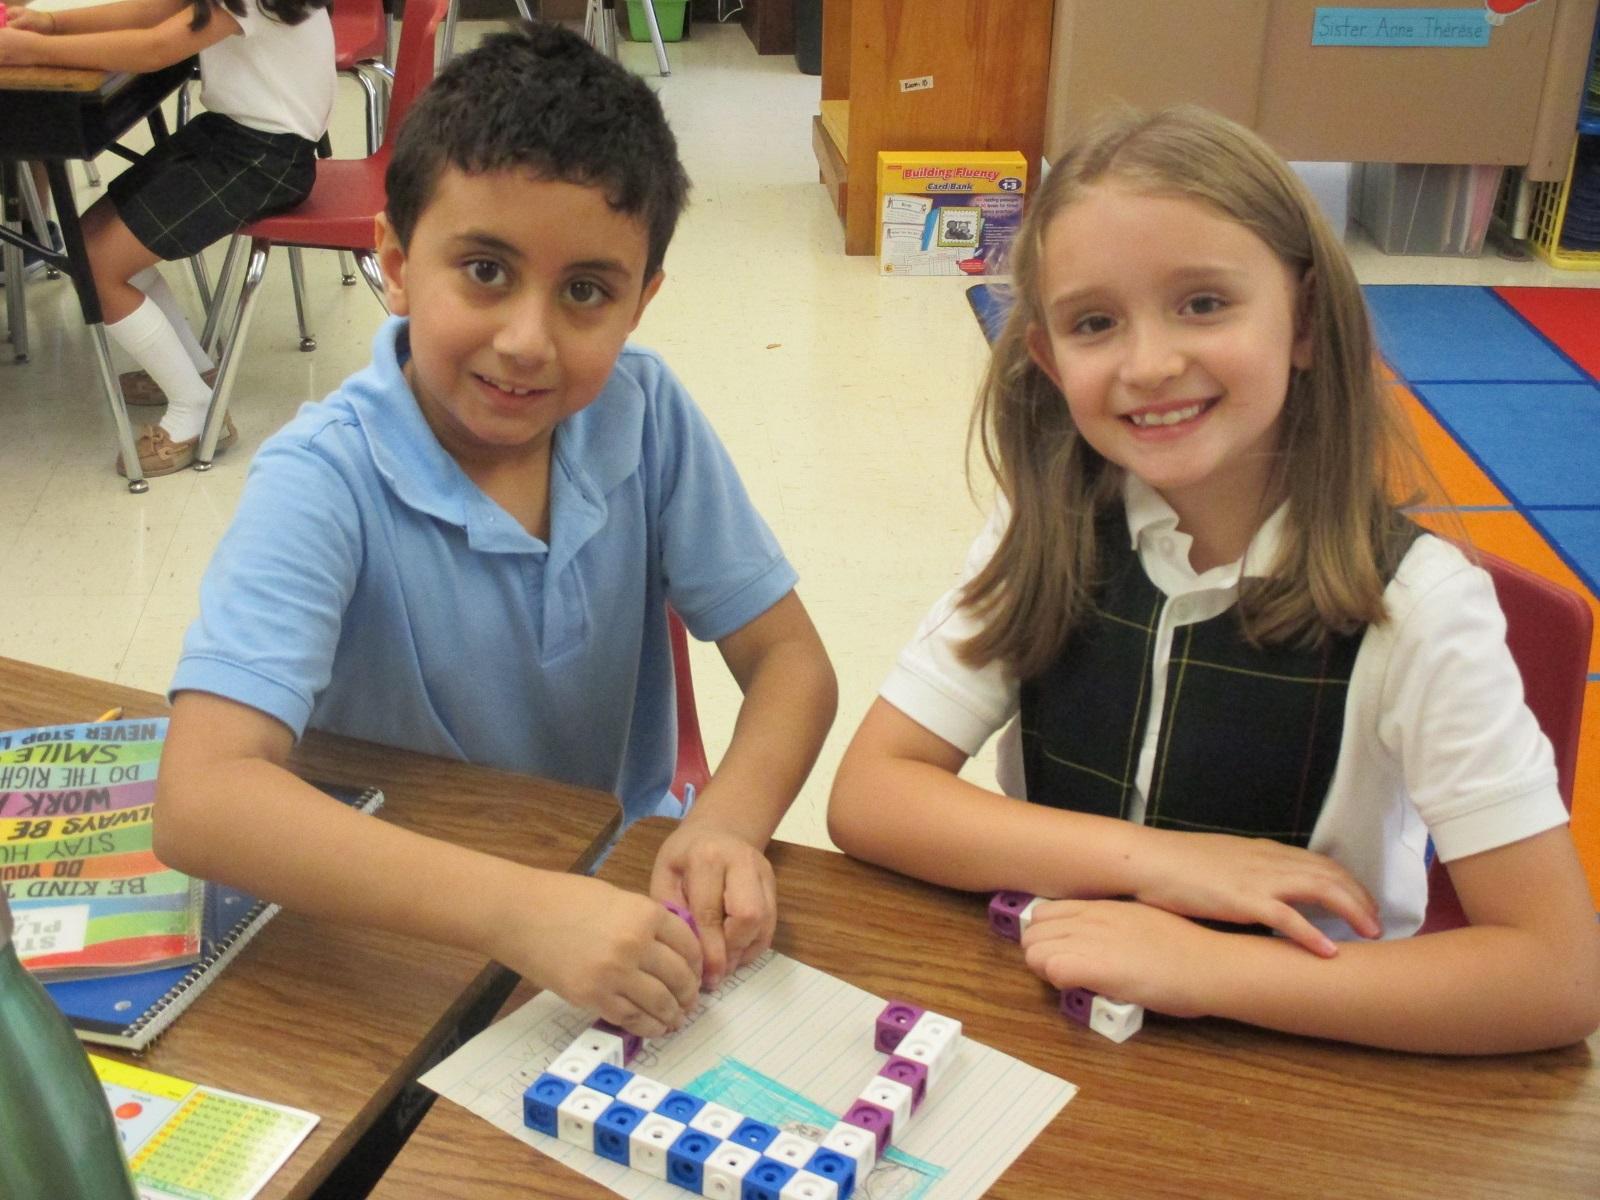 2 students